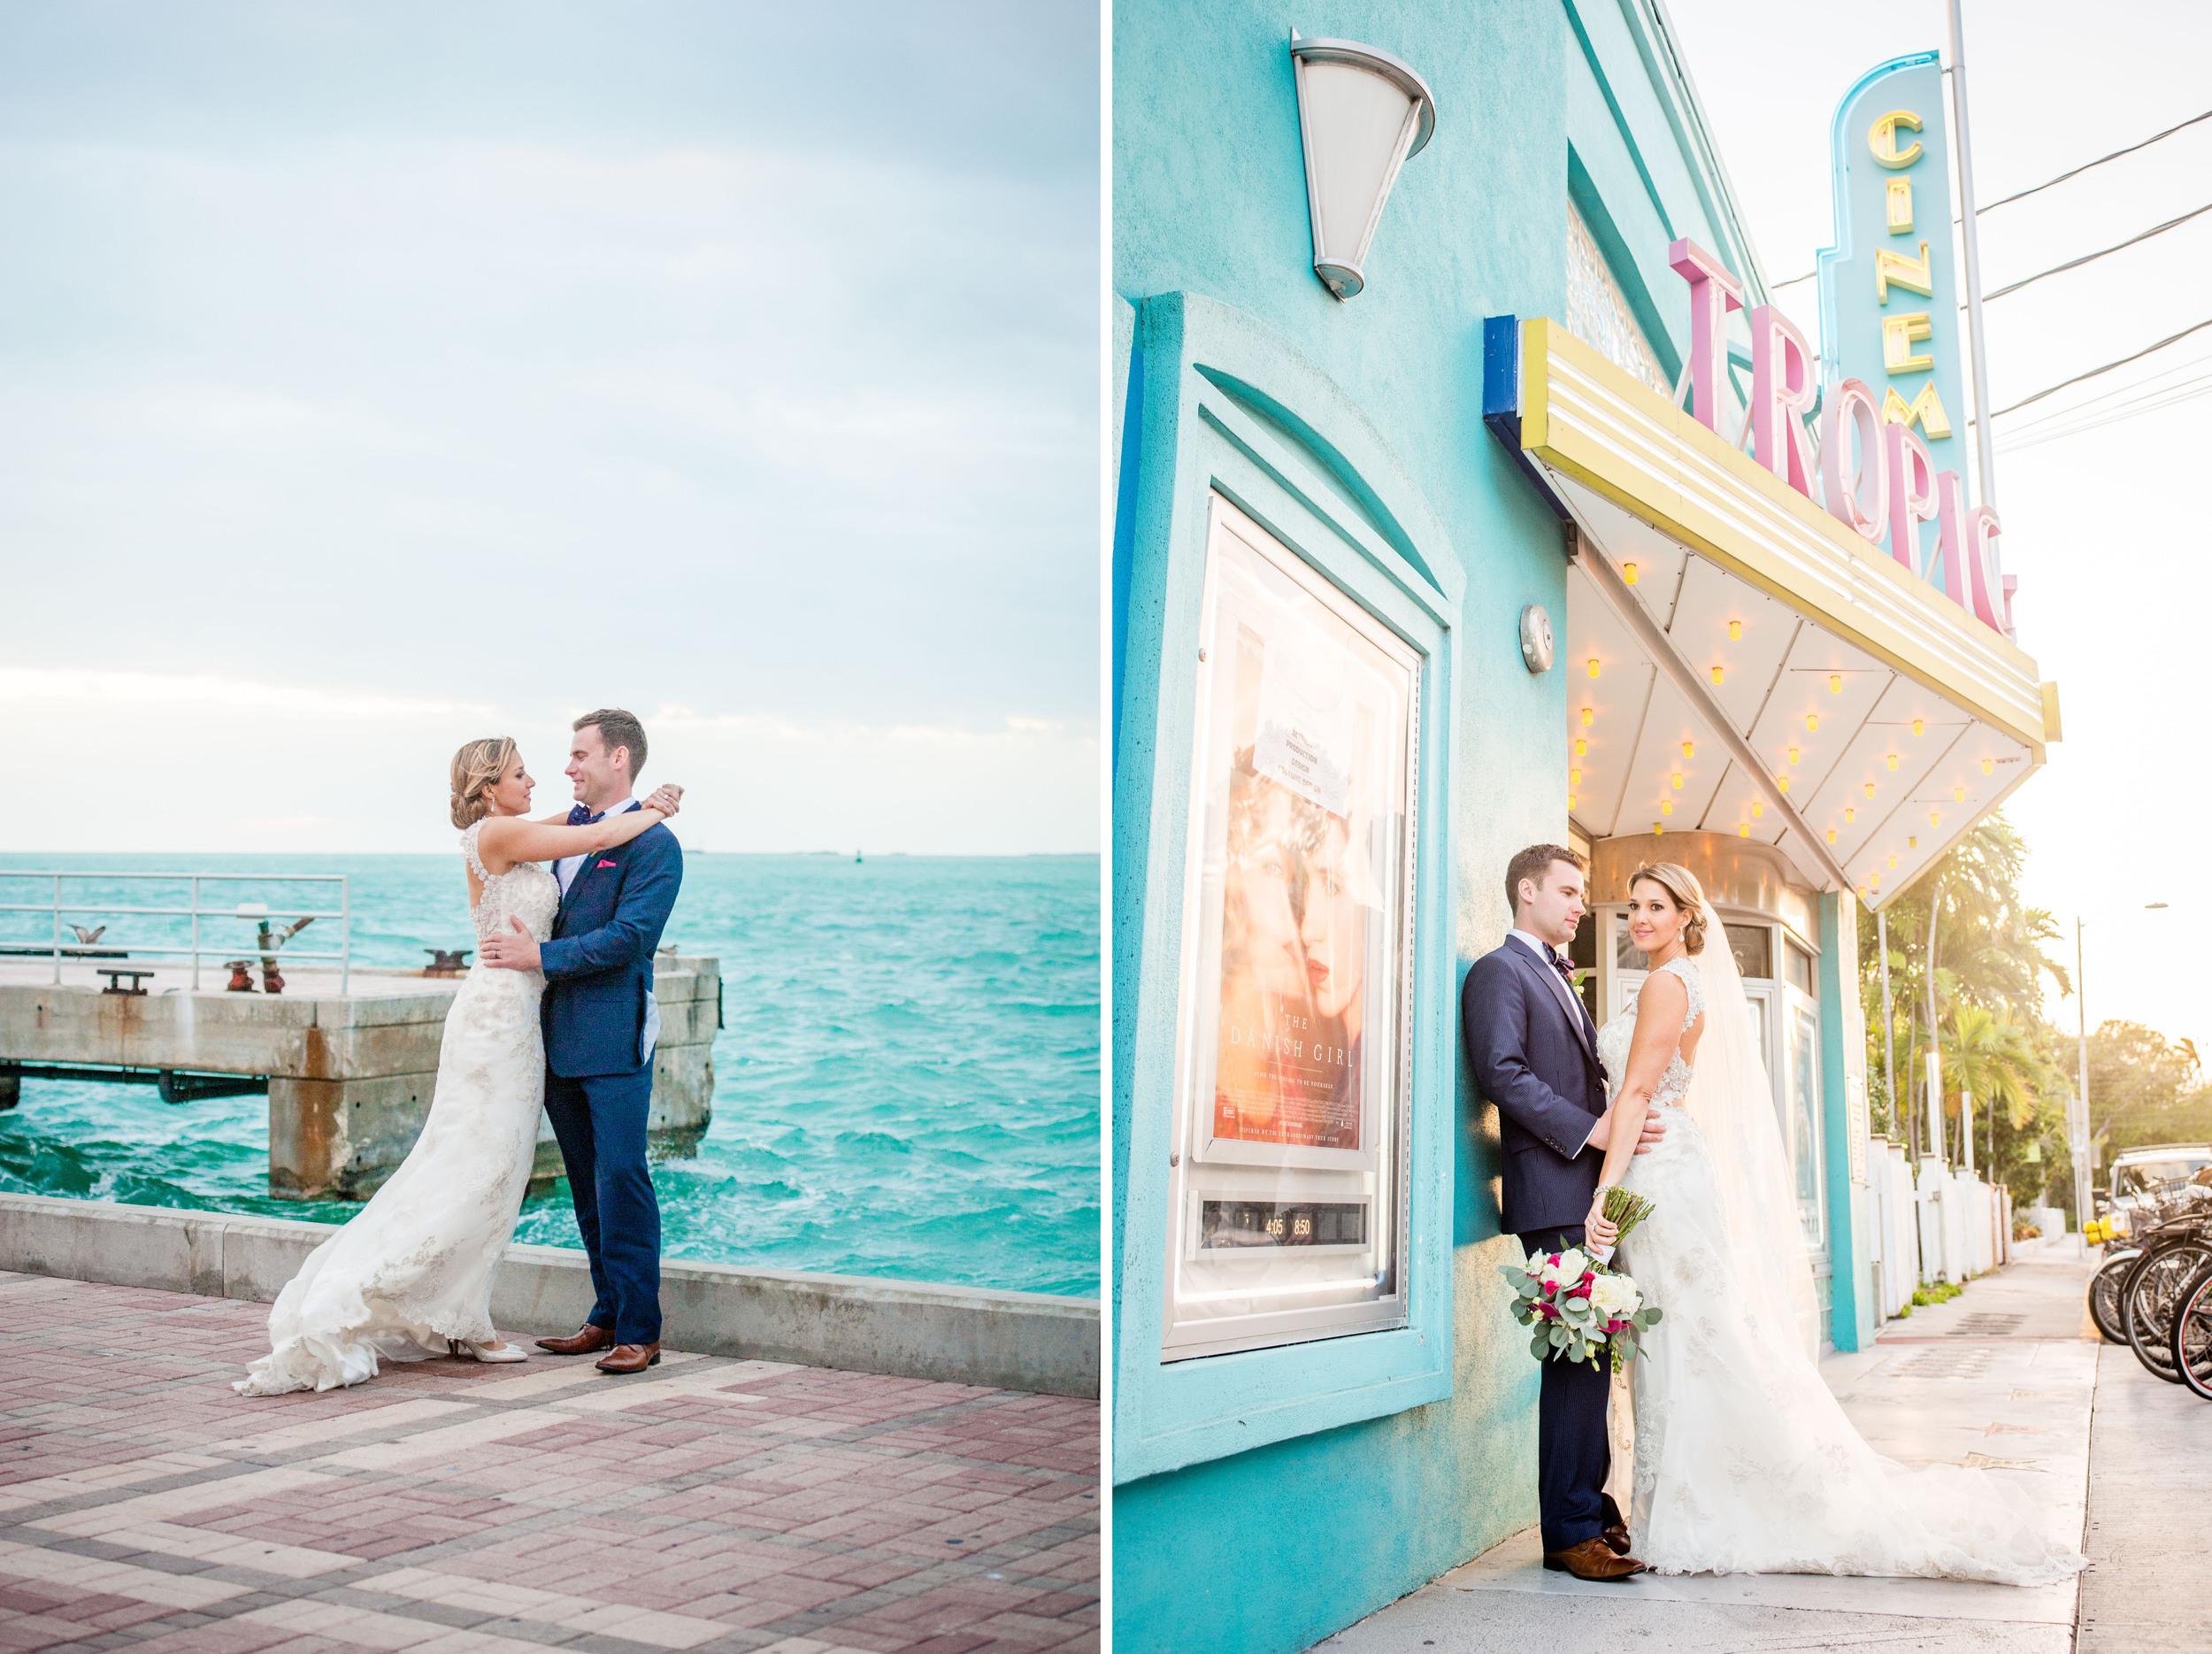 ocean-key-resort-key-west-wedding-045.jpg